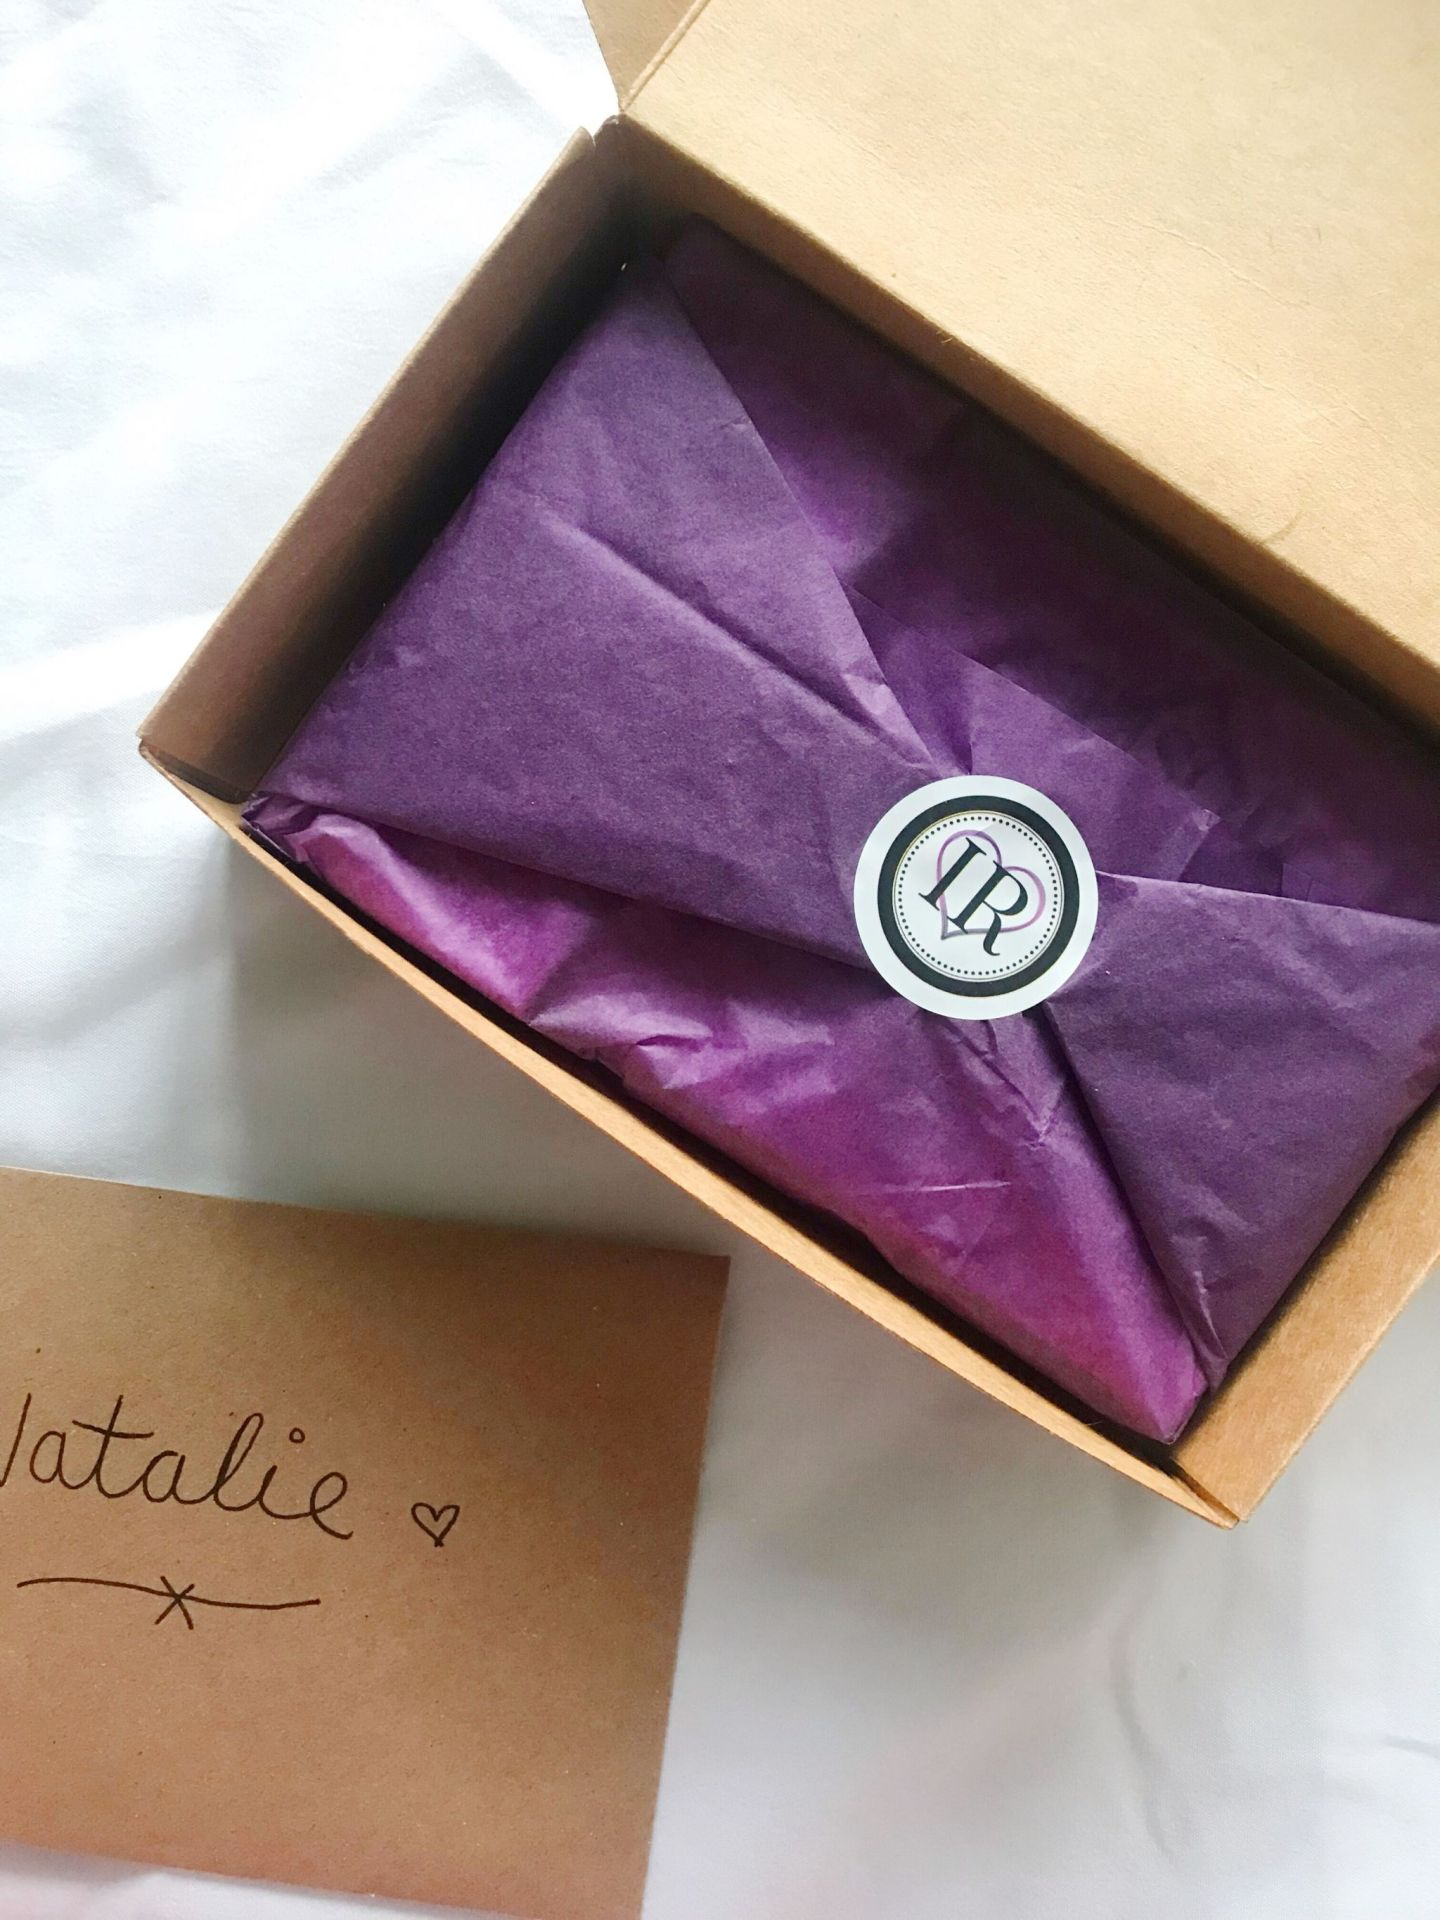 Indigo Rosee Beauty packaging and card